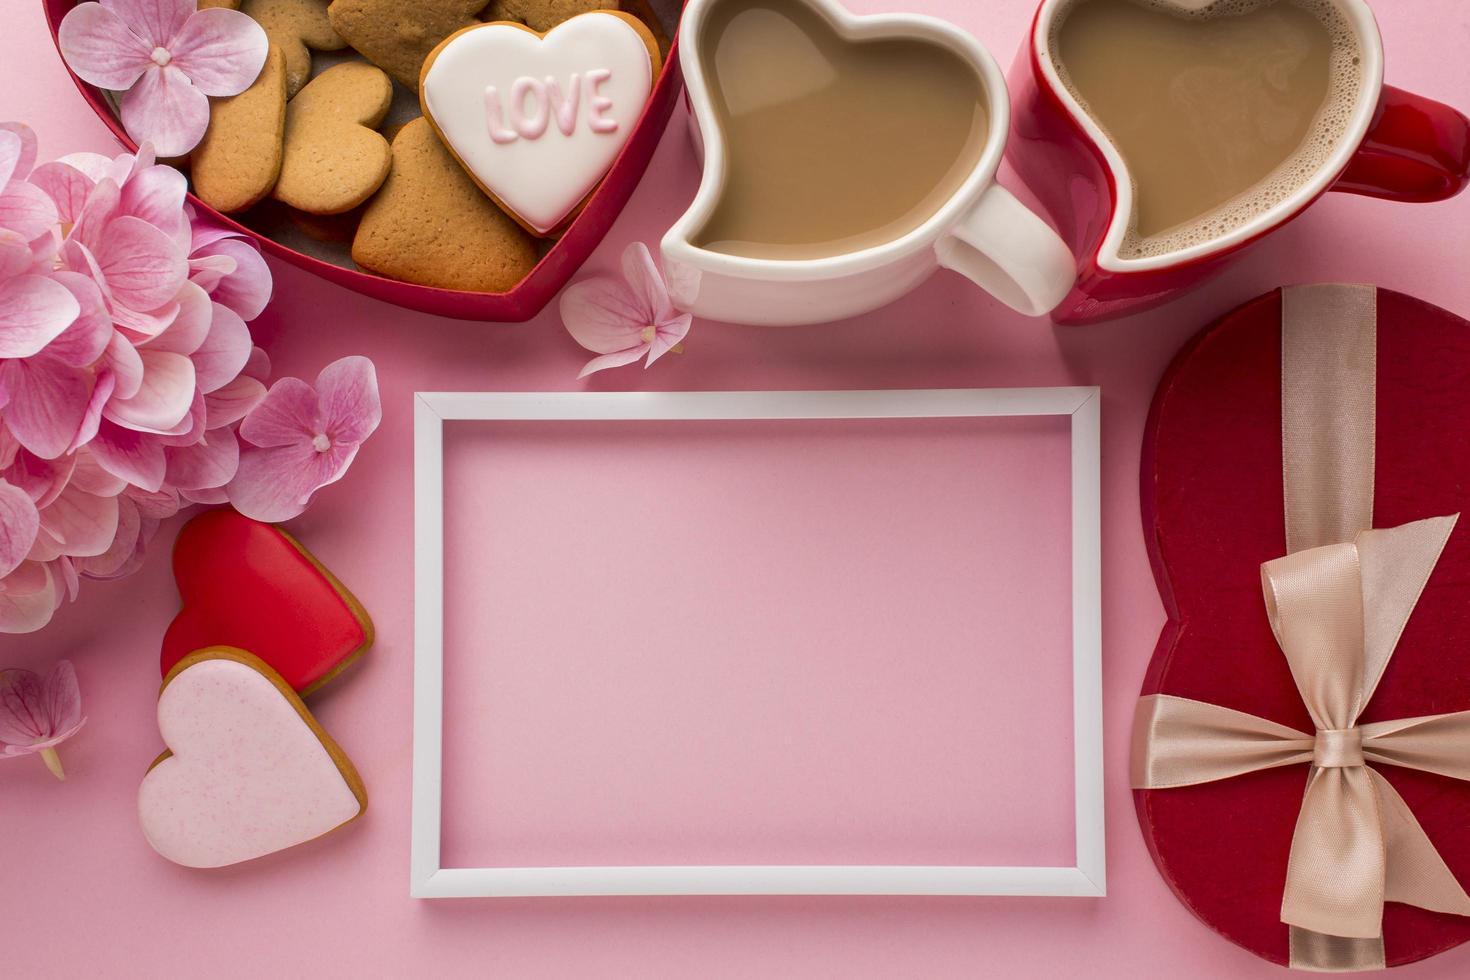 fotolijst en Valentijnsdagitems foto